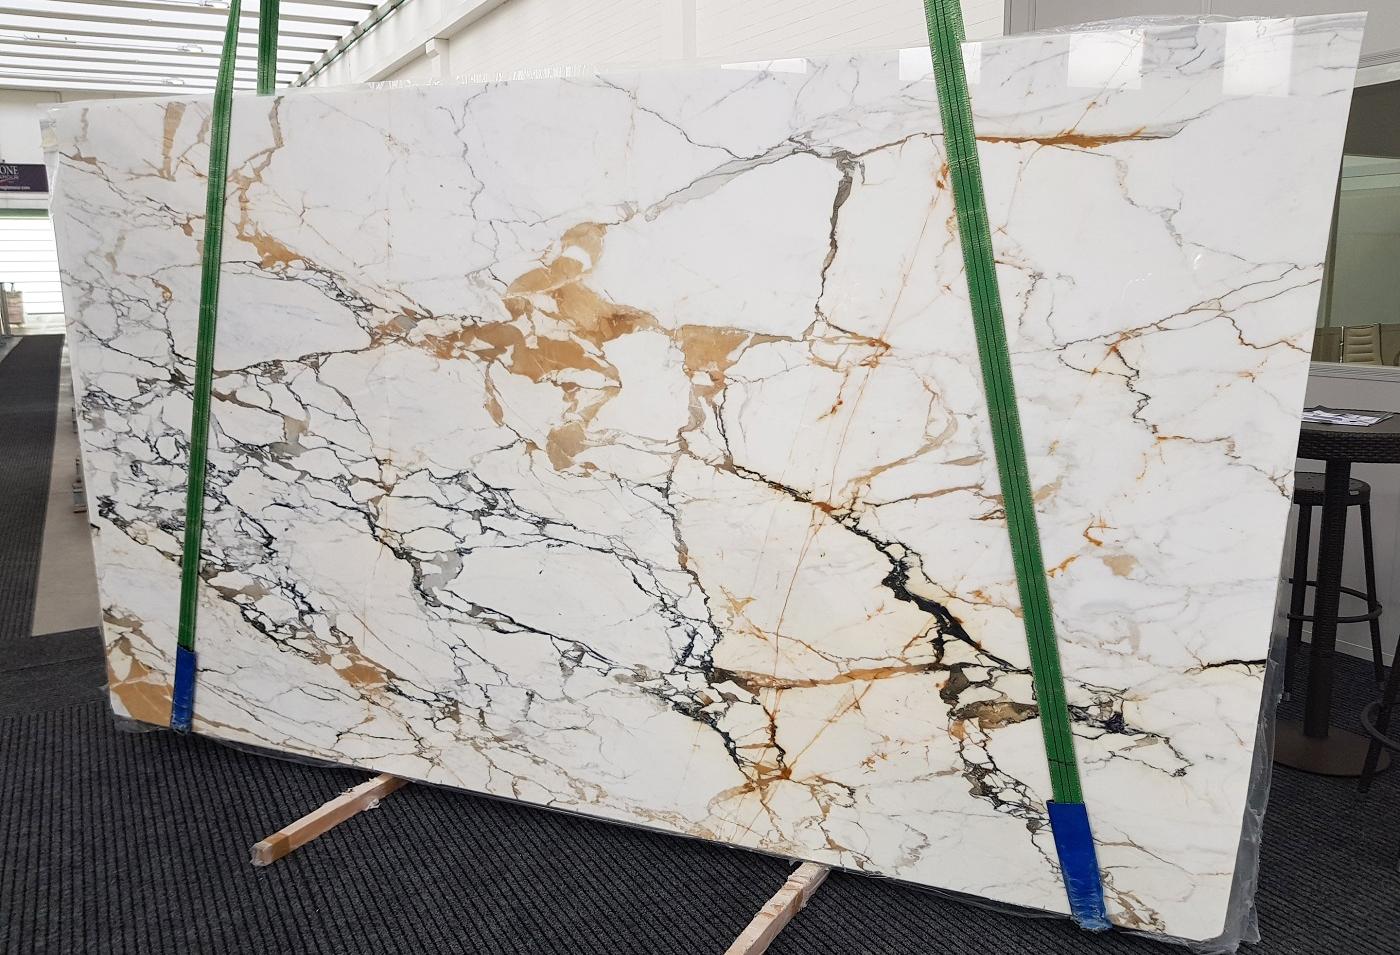 CALACATTA MACCHIAVECCHIA Suministro (Italia) de planchas pulidas en mármol natural GL 1131 , Bundle #2